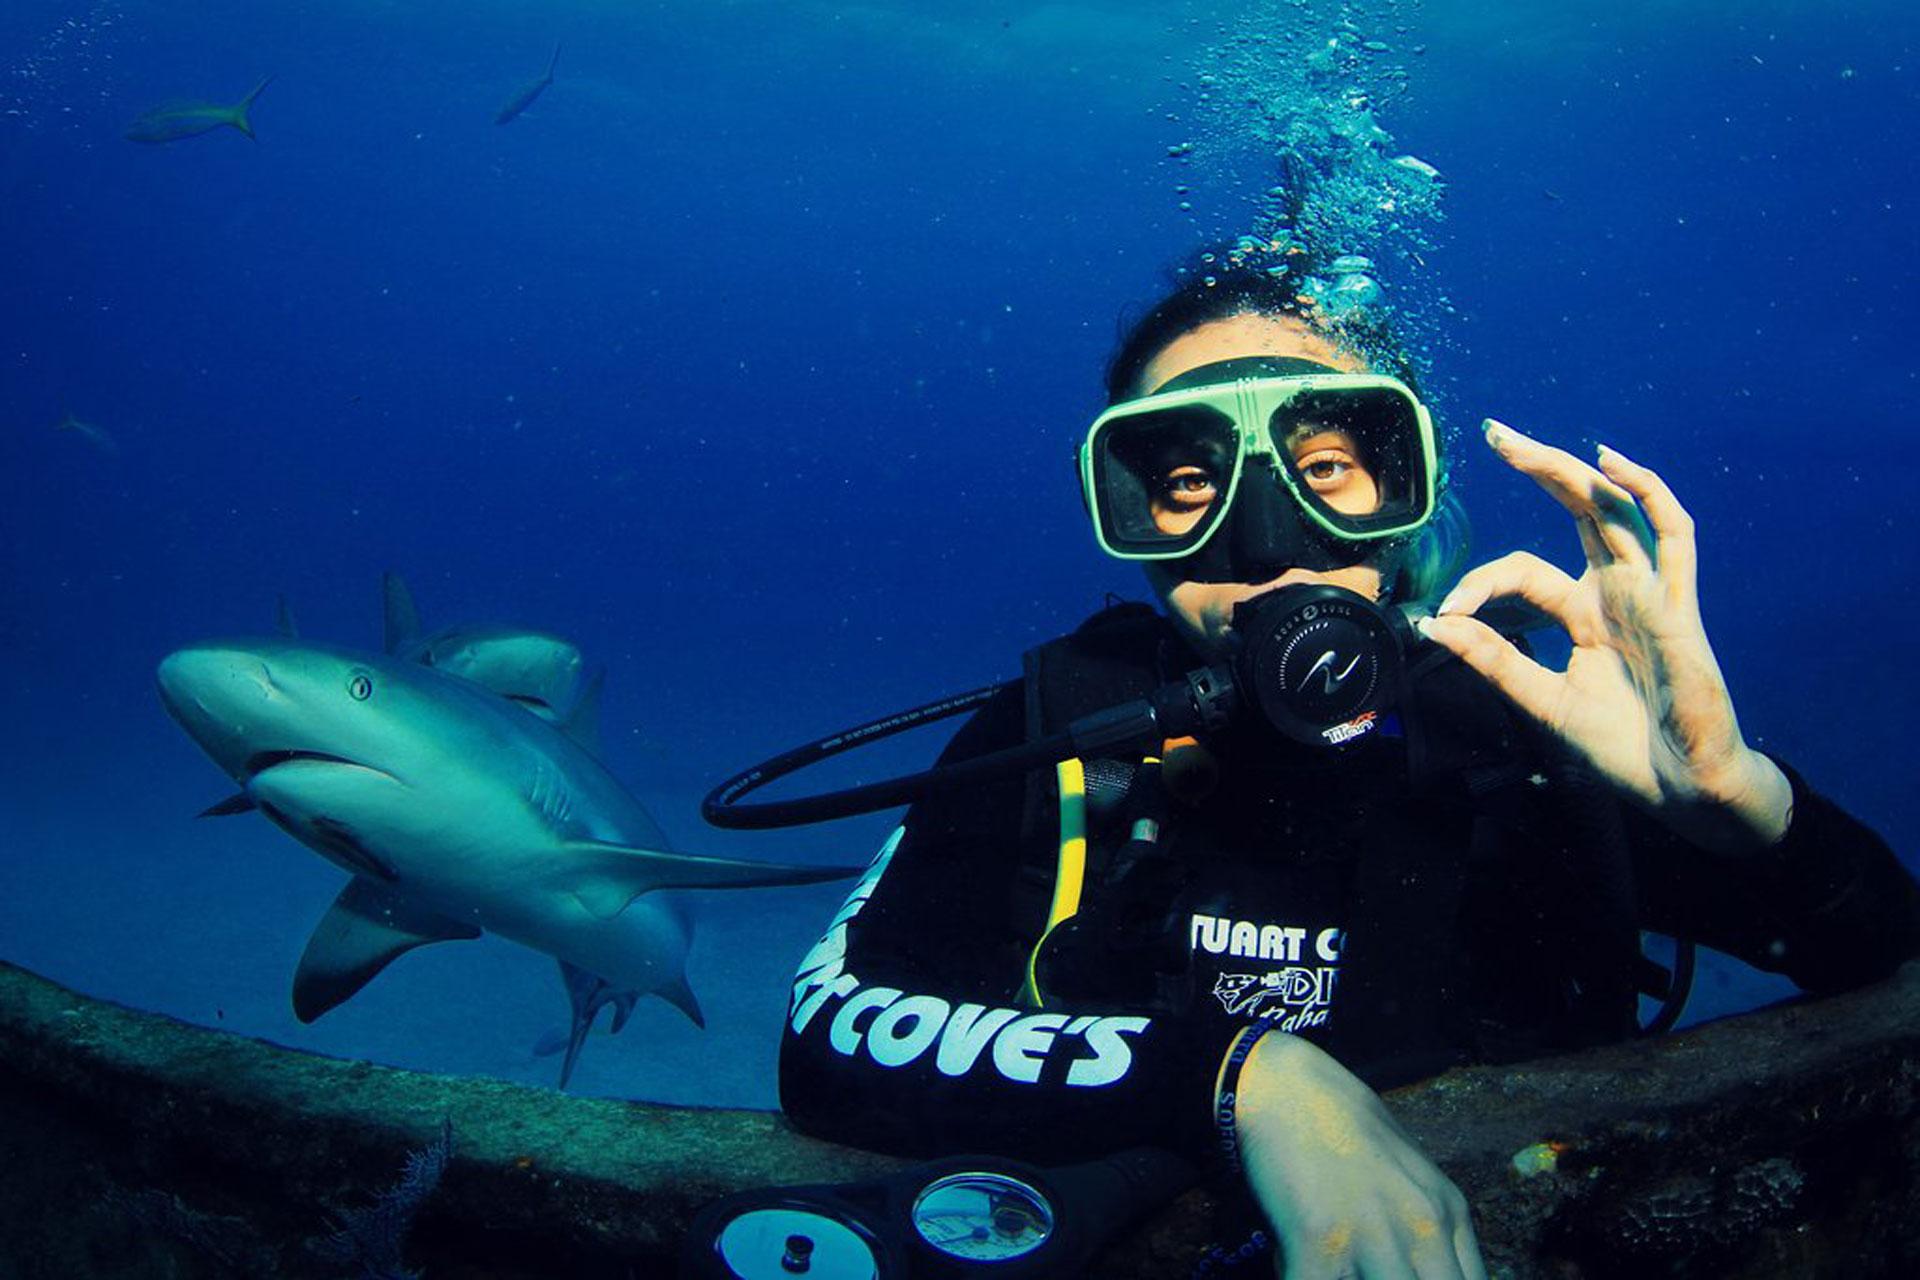 Stuart Cove's Dive in Bahamas; Courtesy of Travelver Photo Alicia C/TripAdvisor.com